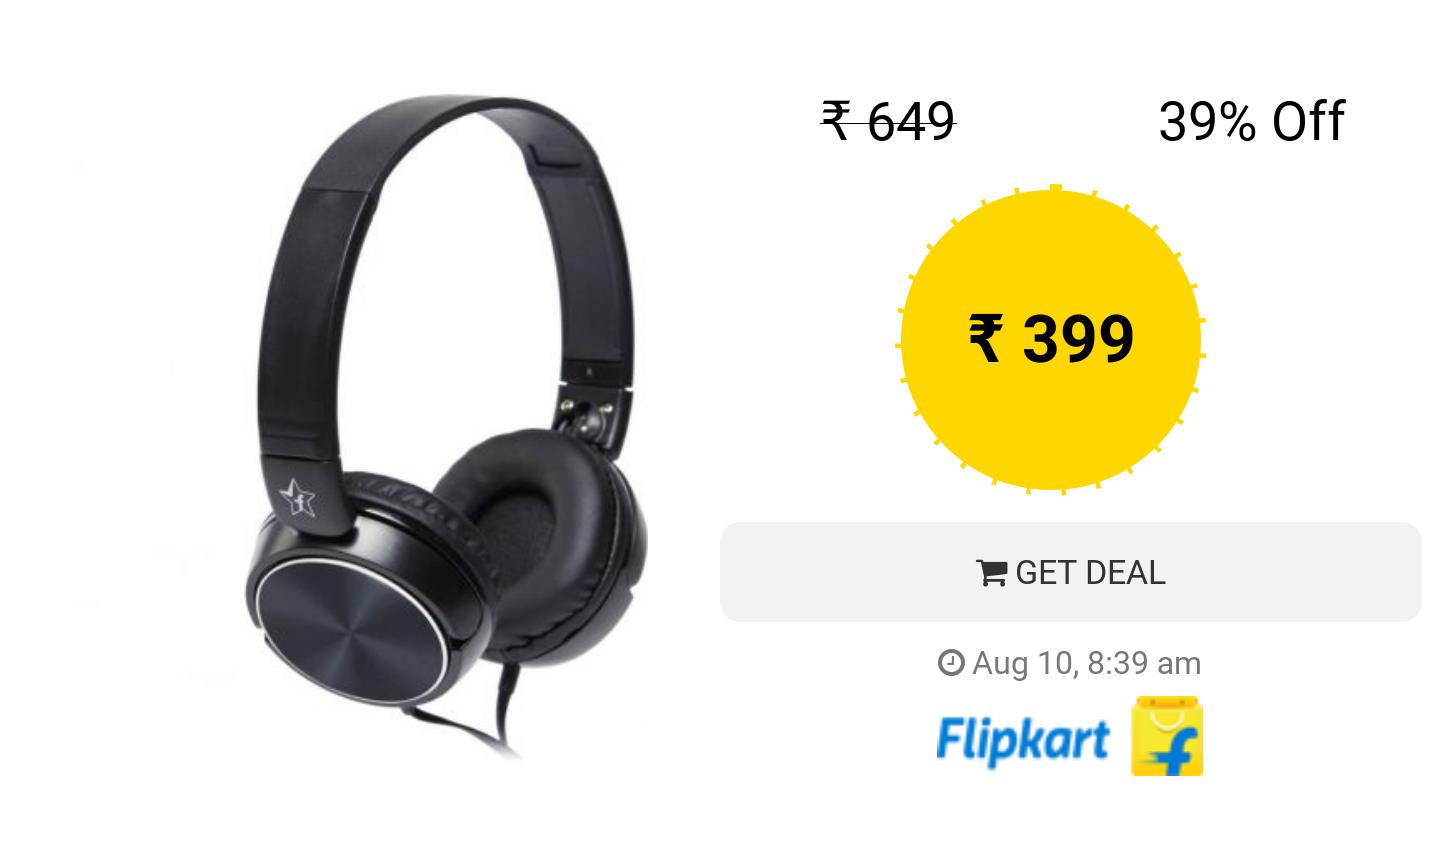 Flipkart Smartbuy Foldable Headphones Black On The Ear Black Headphones Headphones Ear